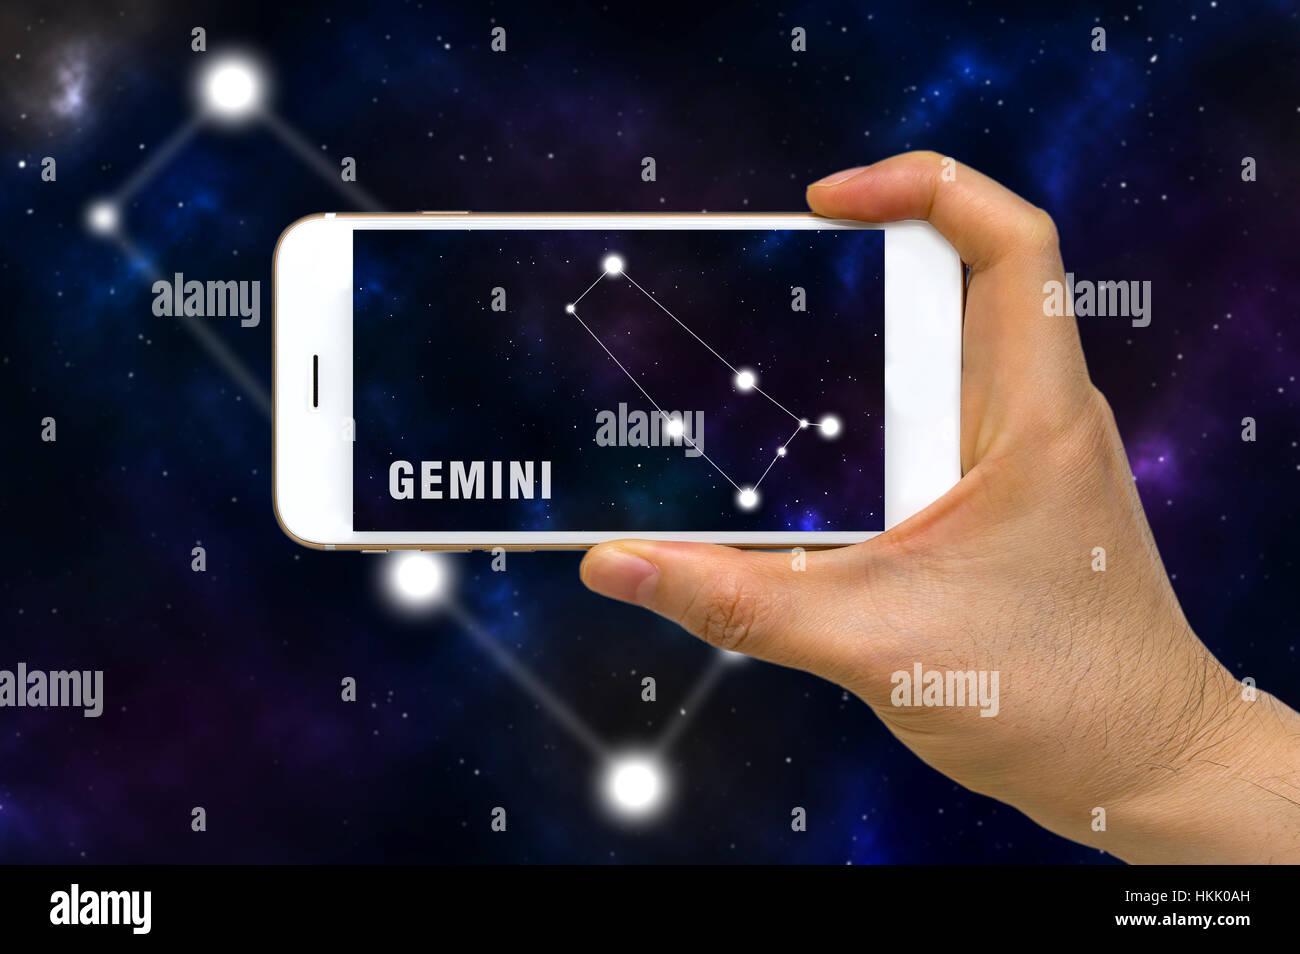 Astronomy App Stock Photos & Astronomy App Stock Images - Alamy